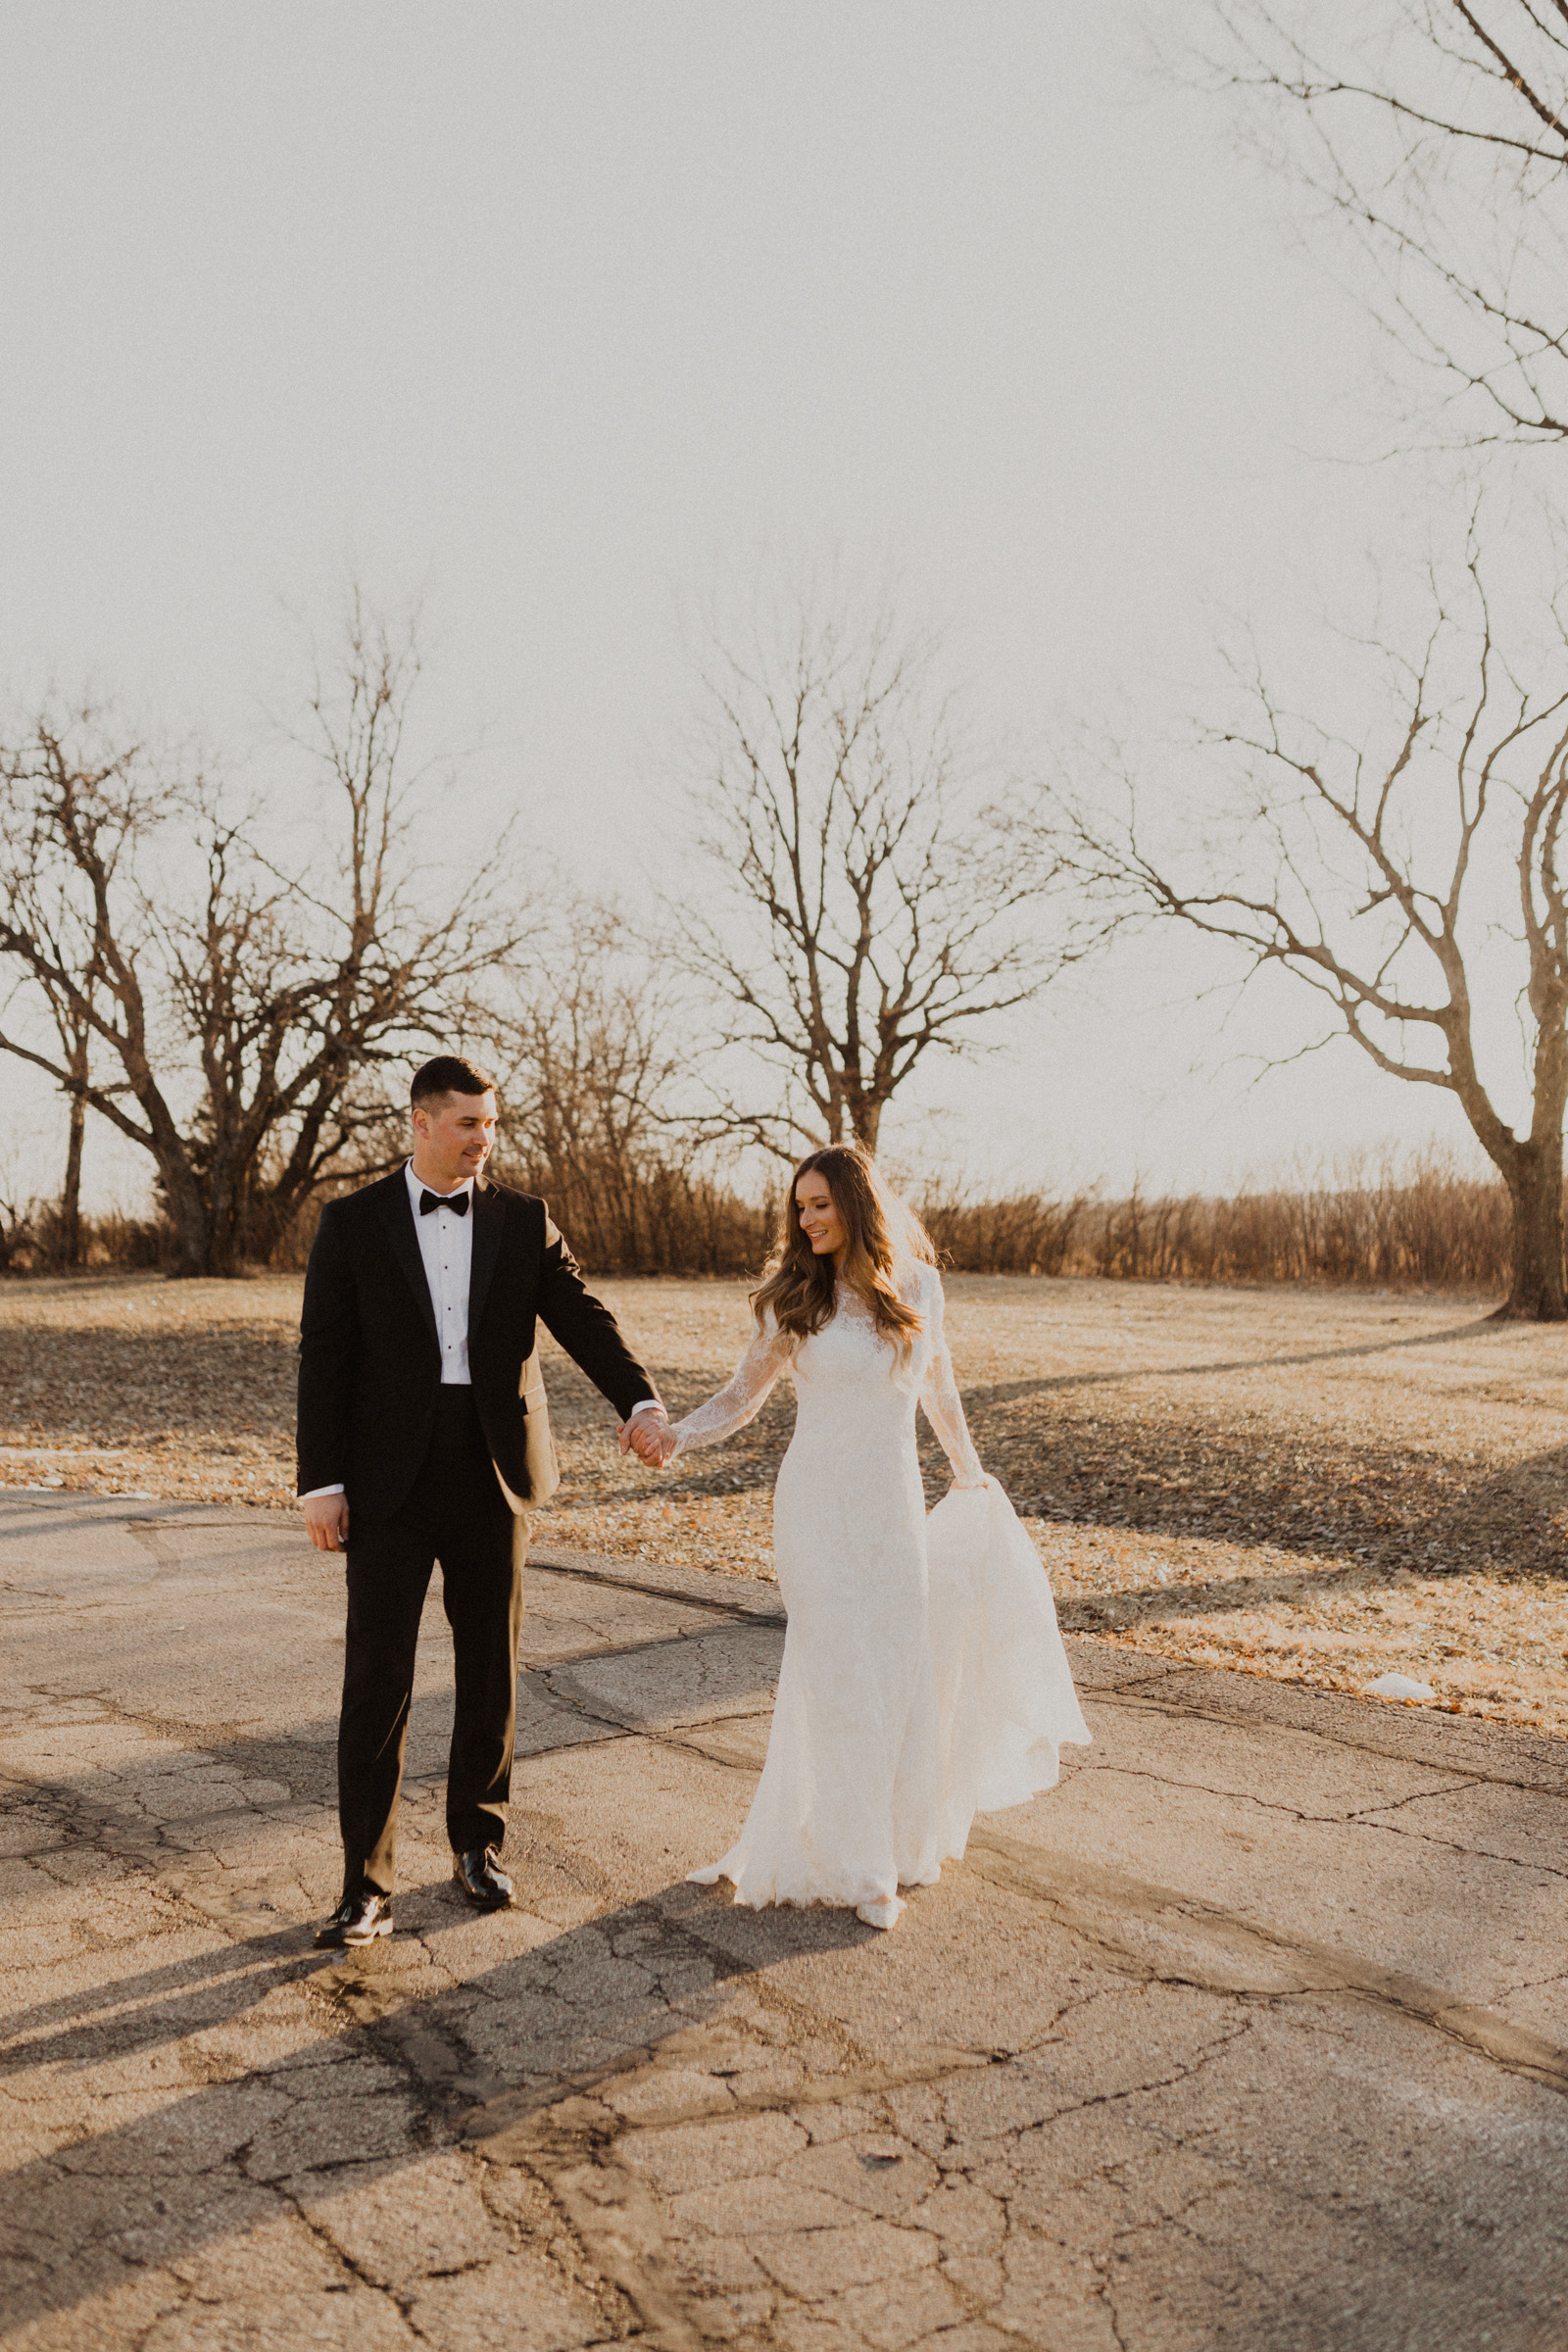 alyssa barletter photography shawnee mission park winter wedding 8th and main grandview missouri photographer-17.jpg